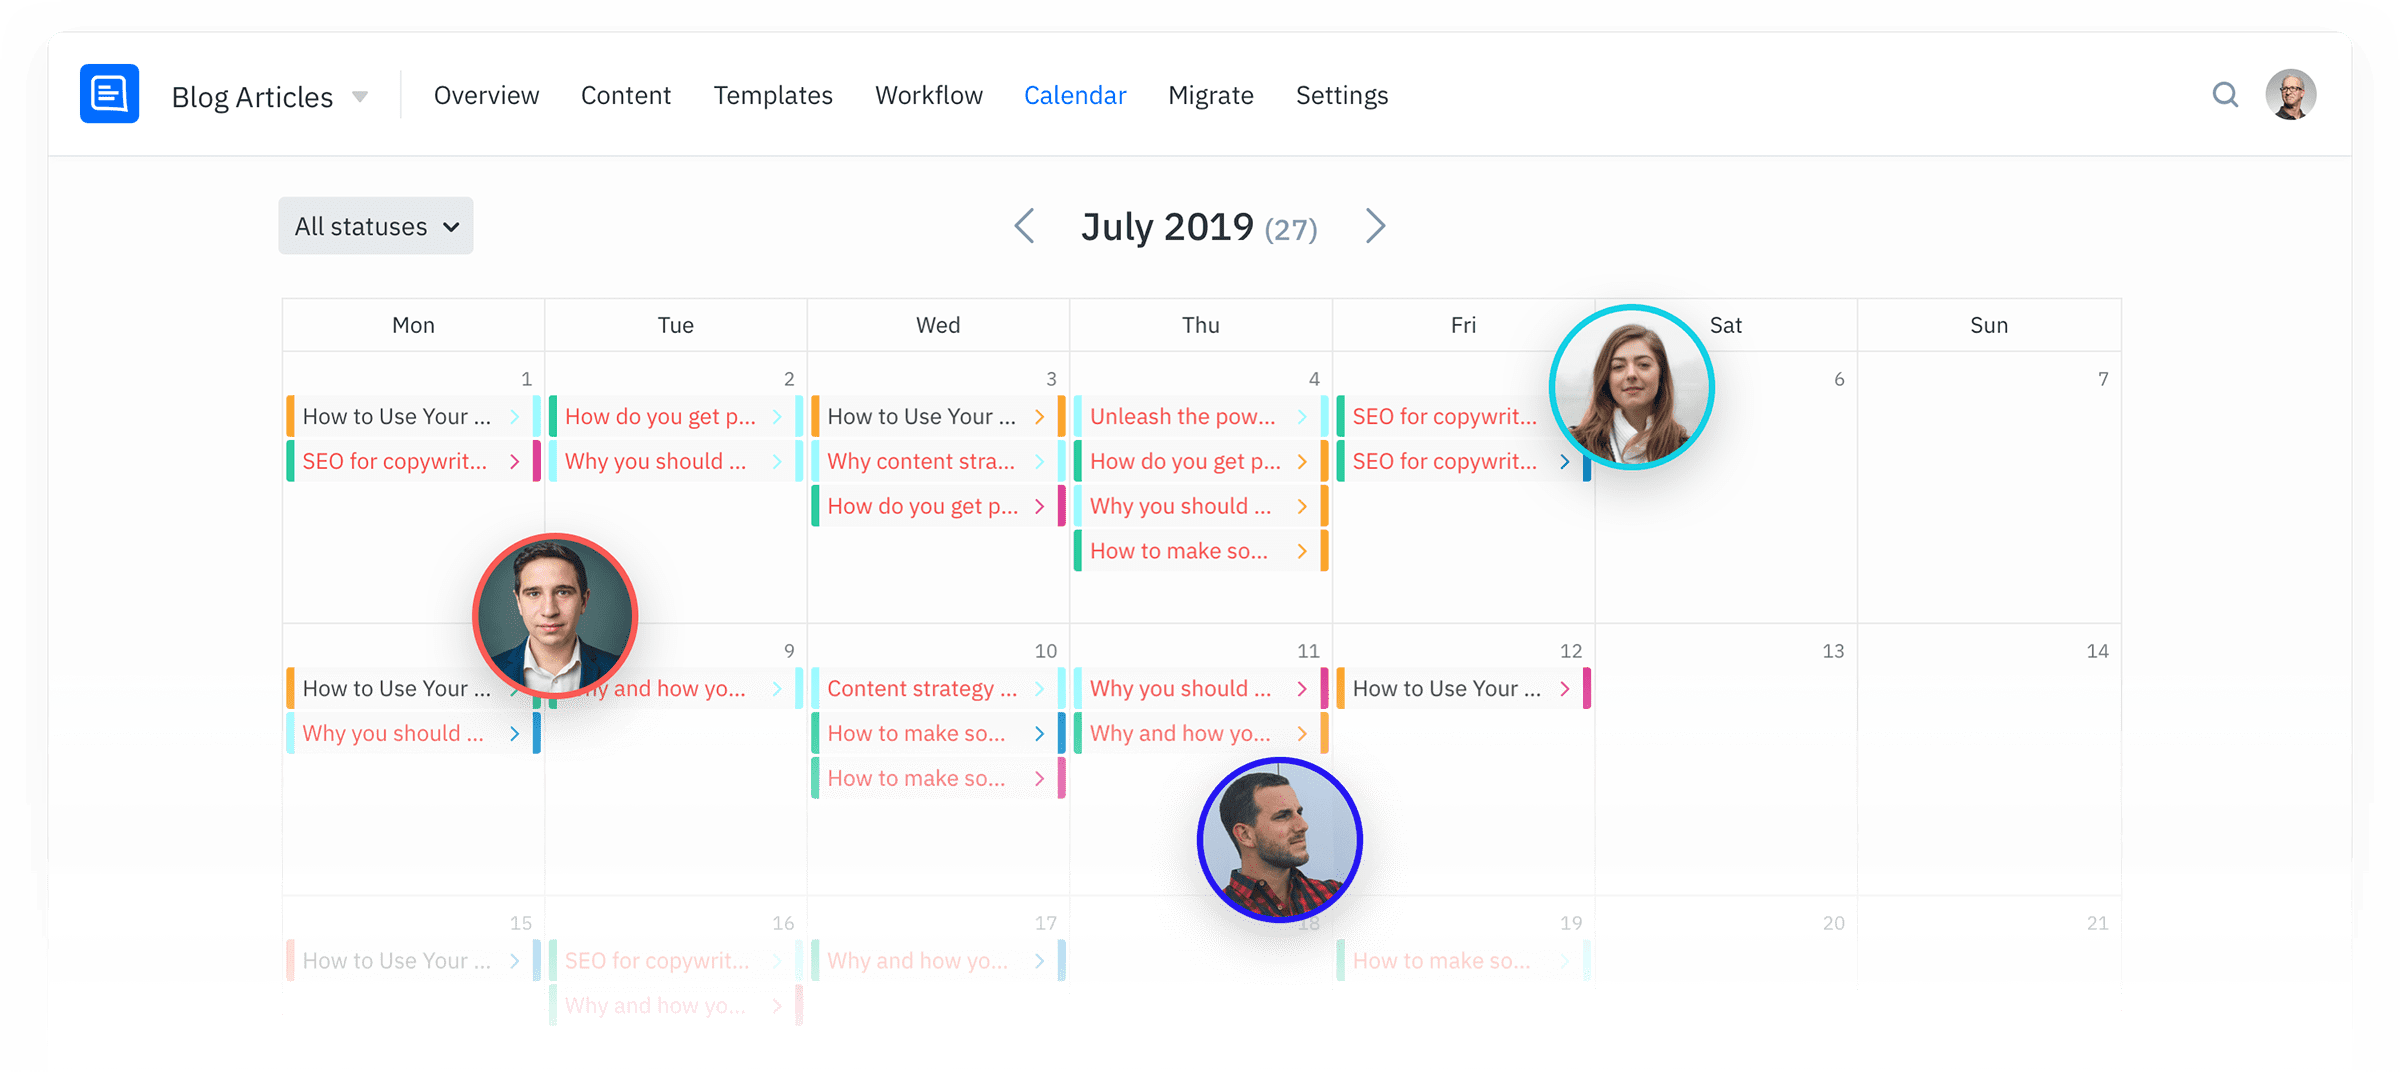 GatherContent editorial content calendar